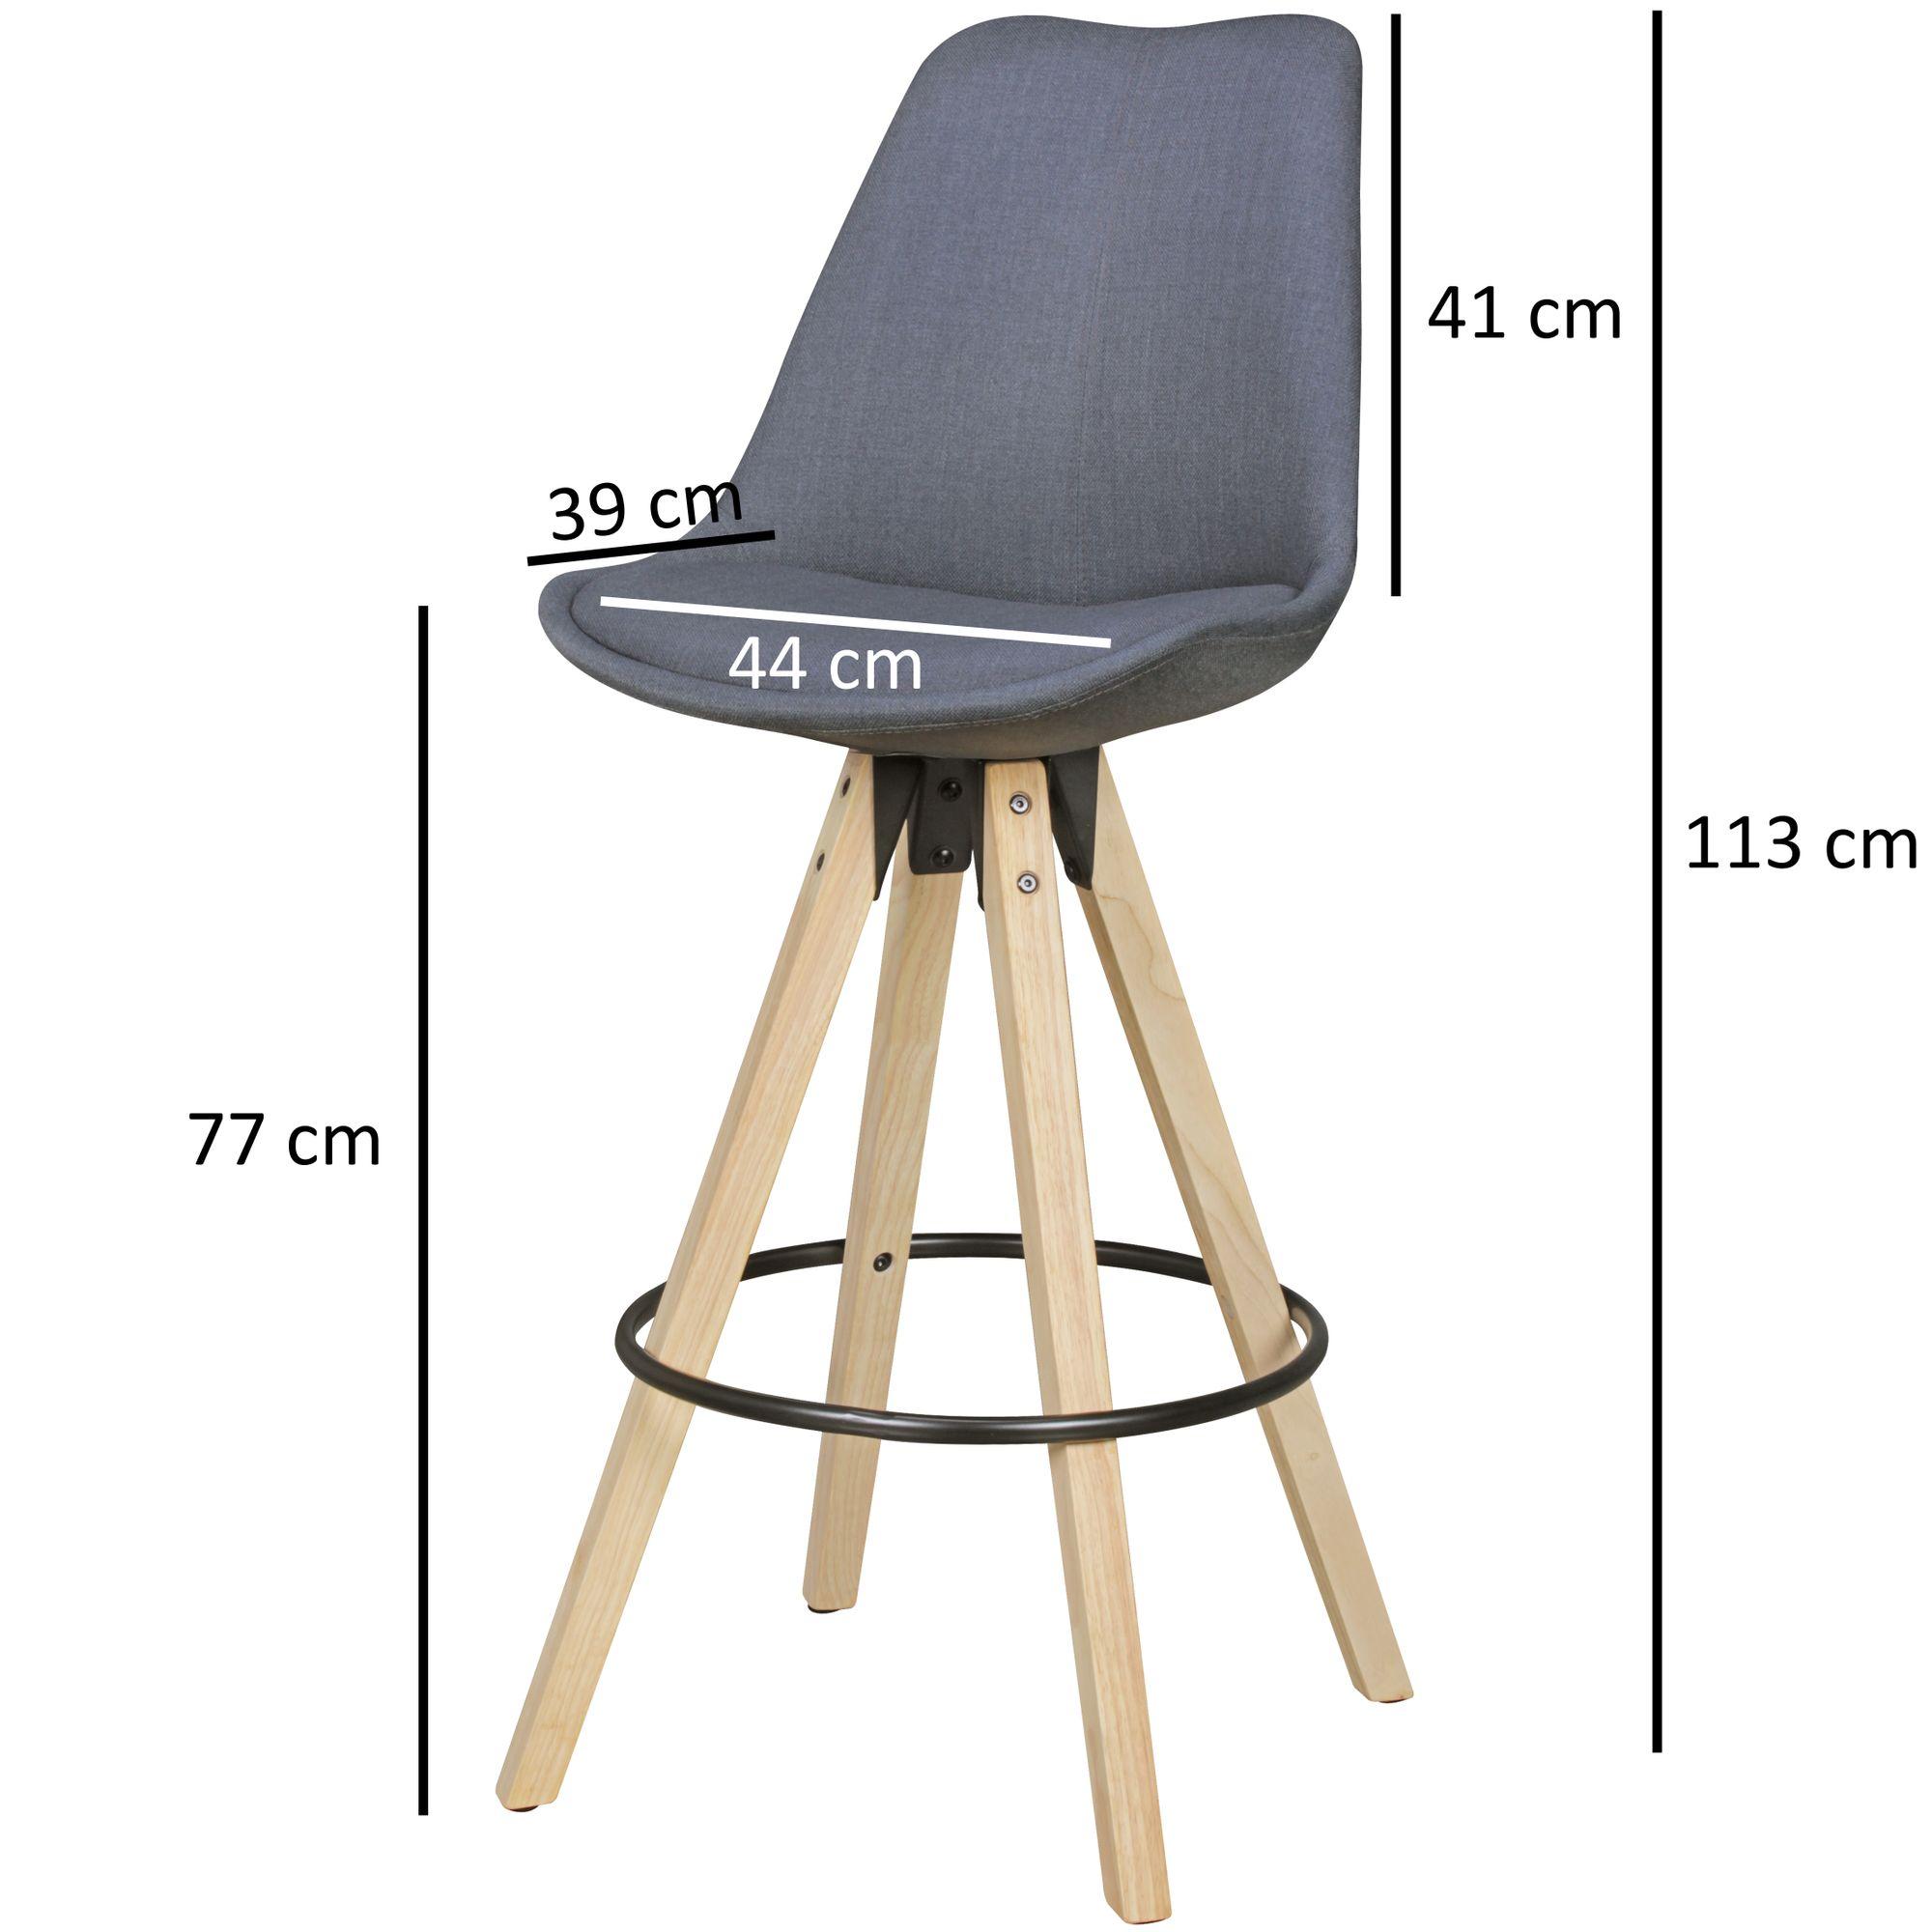 Wohnling 2er Set Barhocker Lima Anthrazit Retro Design Stoff Holz Mit Lehne Design Barstuhl Retro